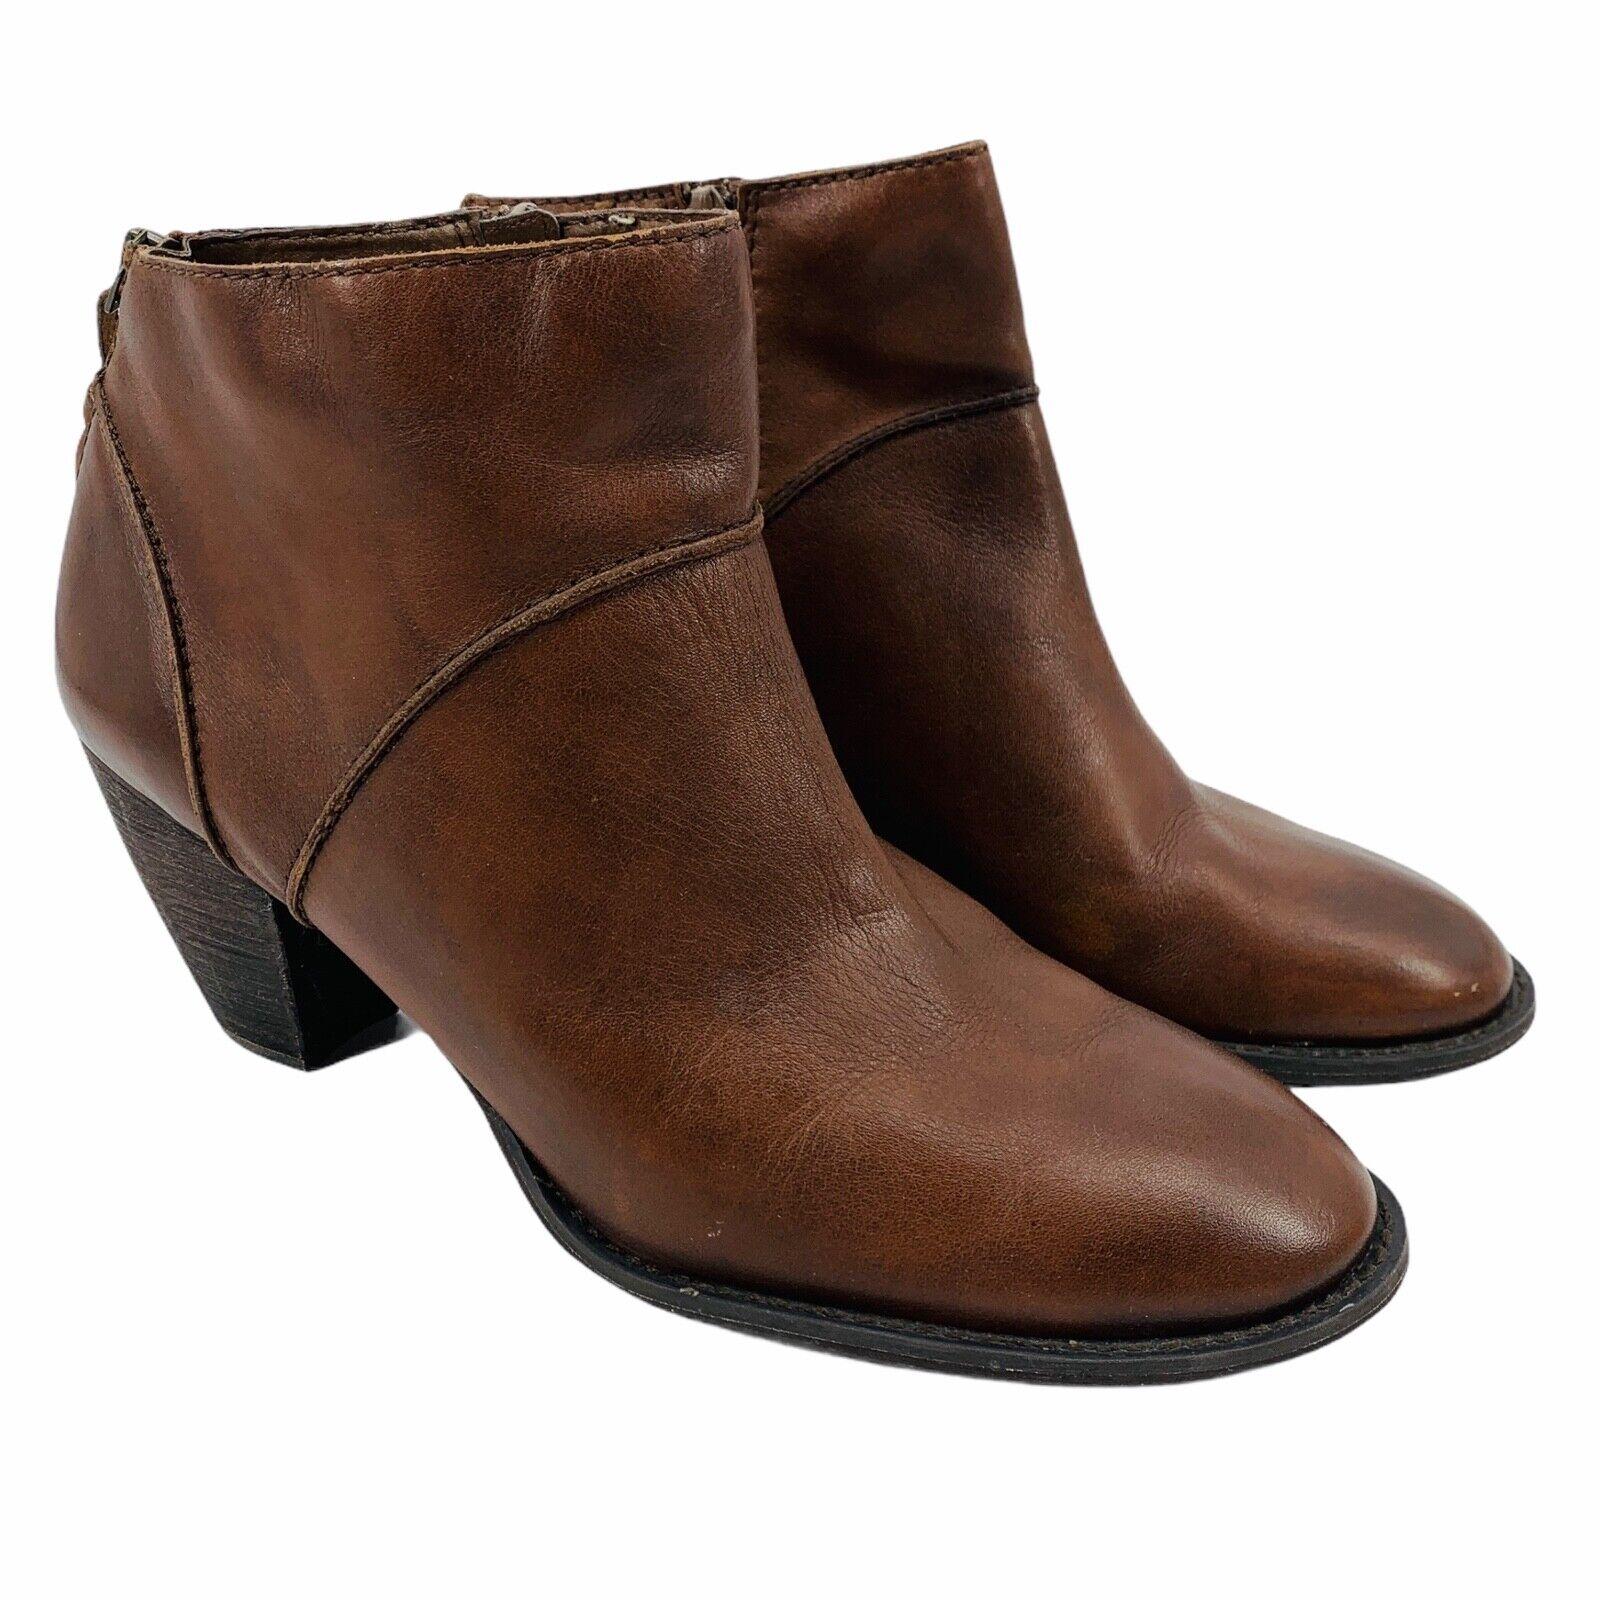 Tesori Women's 12 Dark Brown Leather Side Zip Ankle Bootie Heel